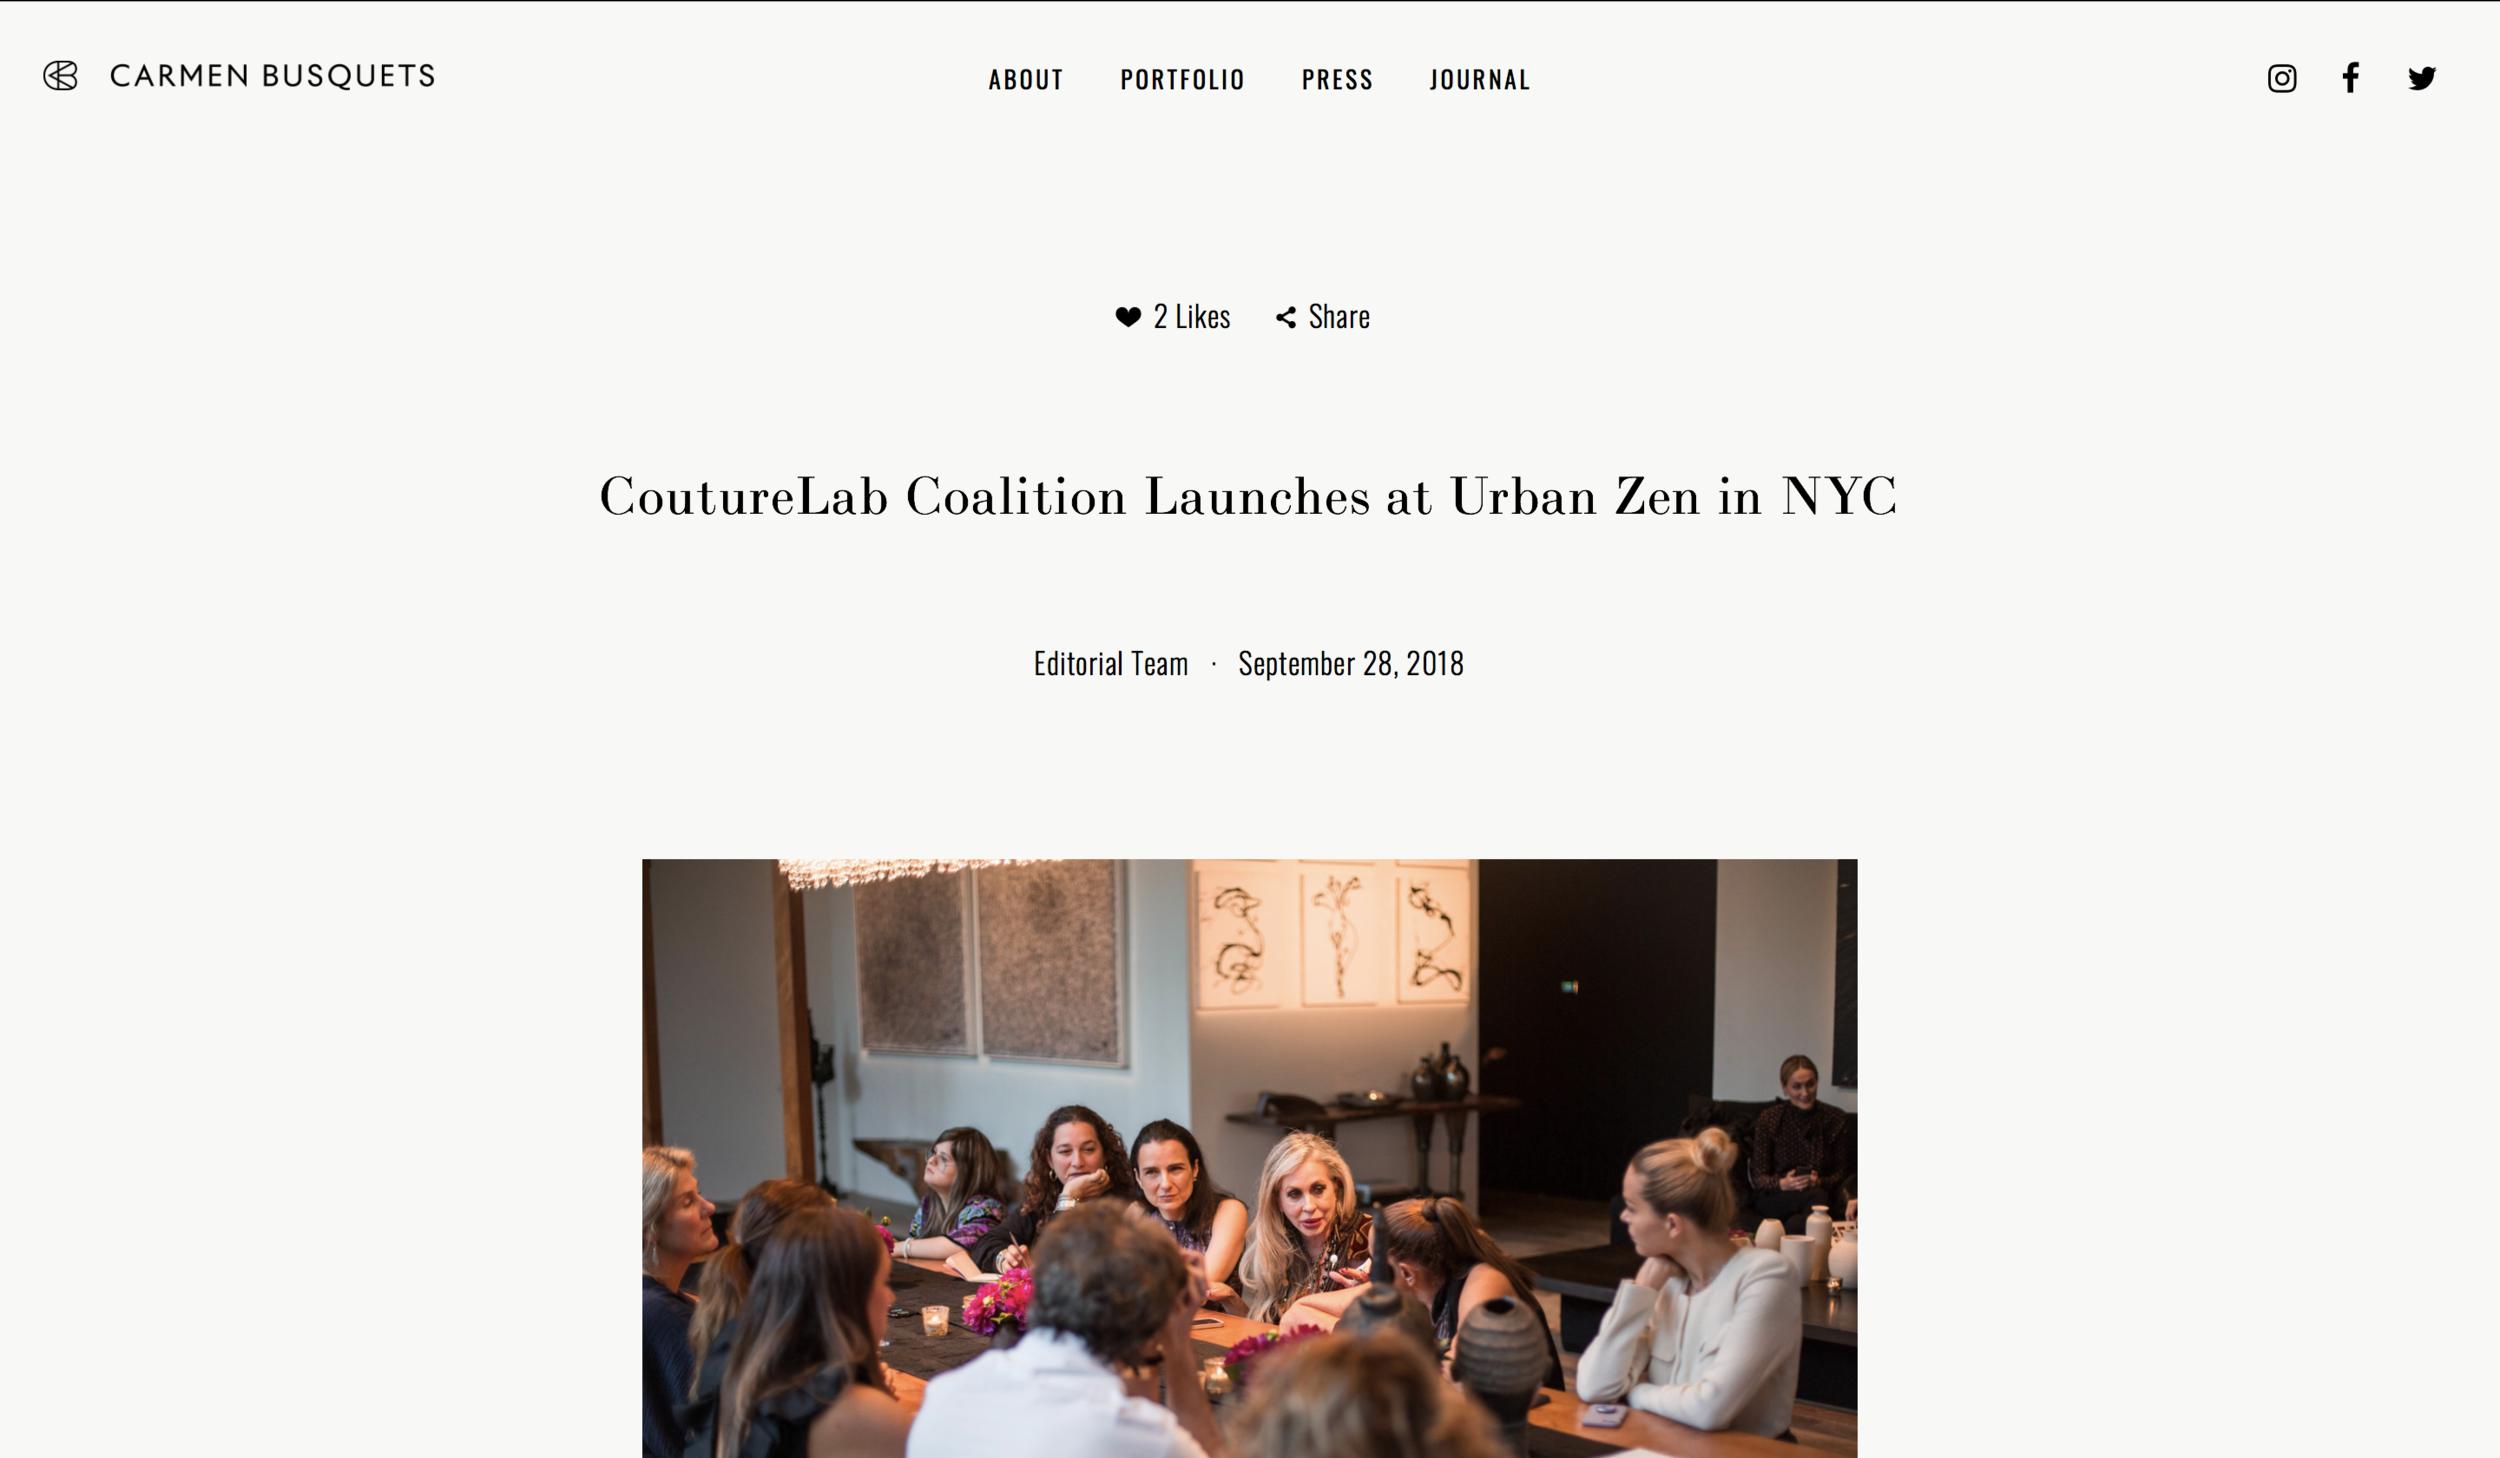 - CoutureLab Coalition Launches at Urban Zen in NYC(Carmen Busquets)https://www.carmenbusquets.com/journal/post/couturelab-coalition-launches-at-urban-zen-in-nyc